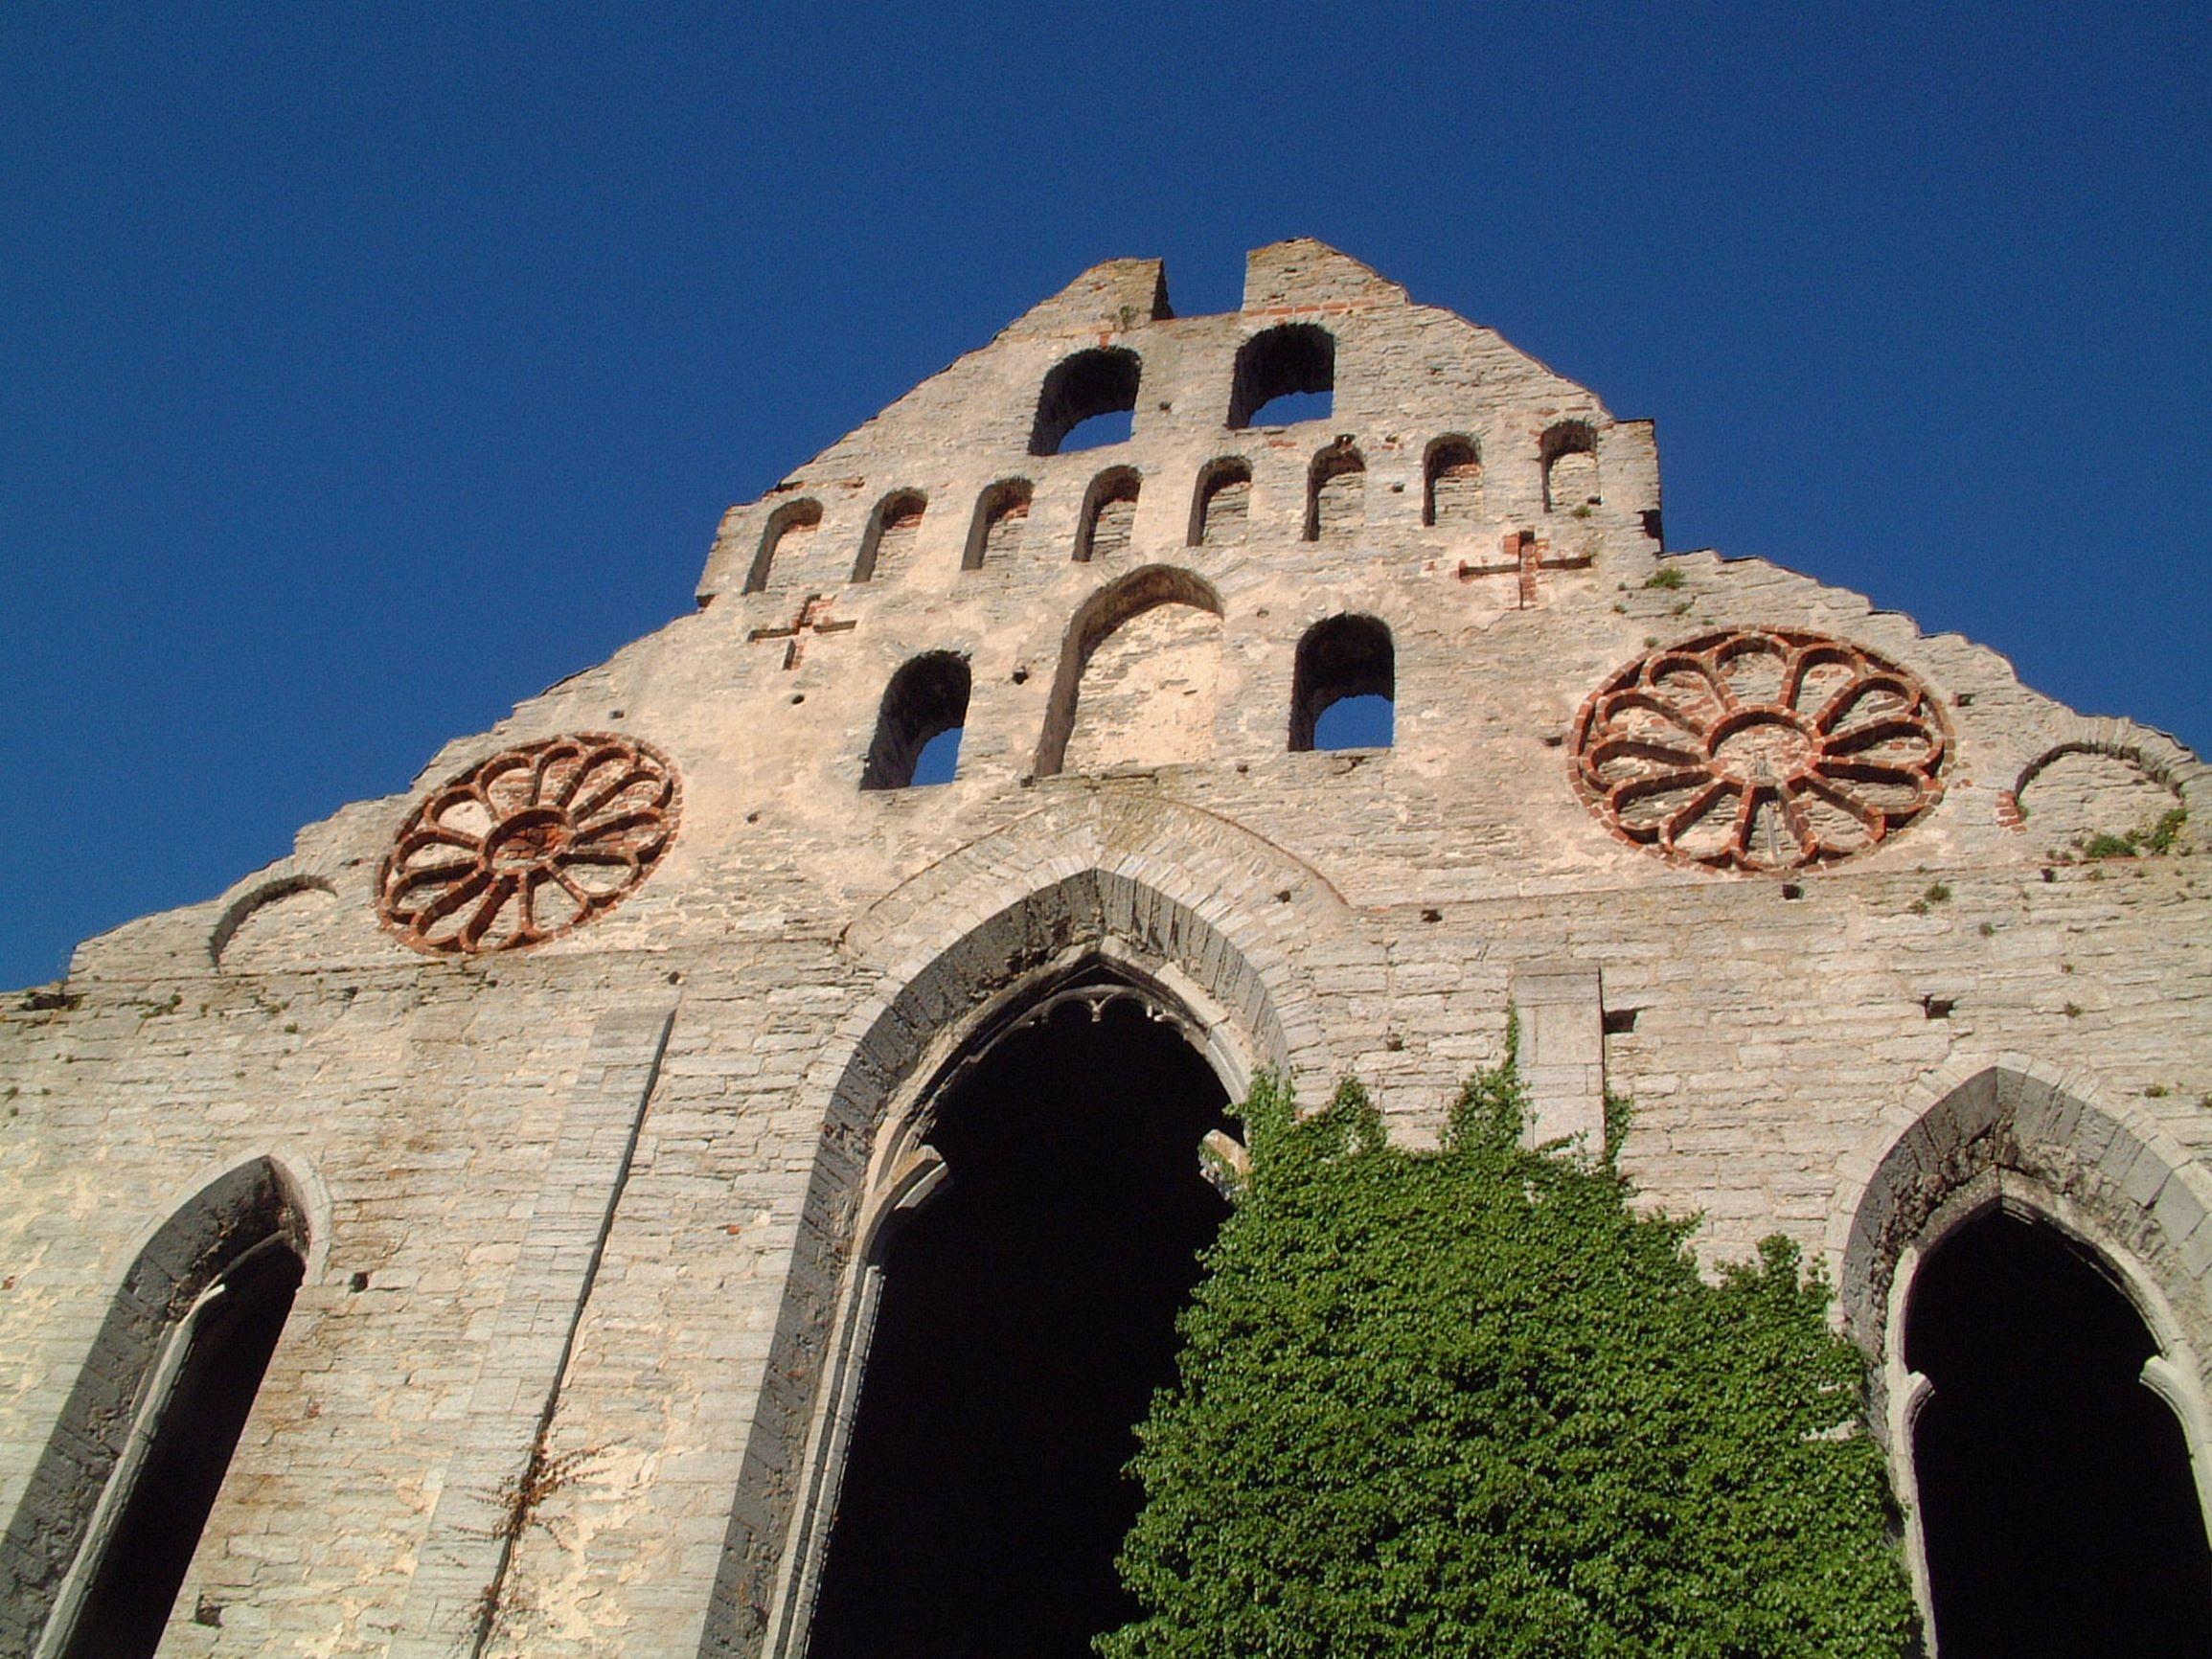 Sankt Nicolai ruin i Visby